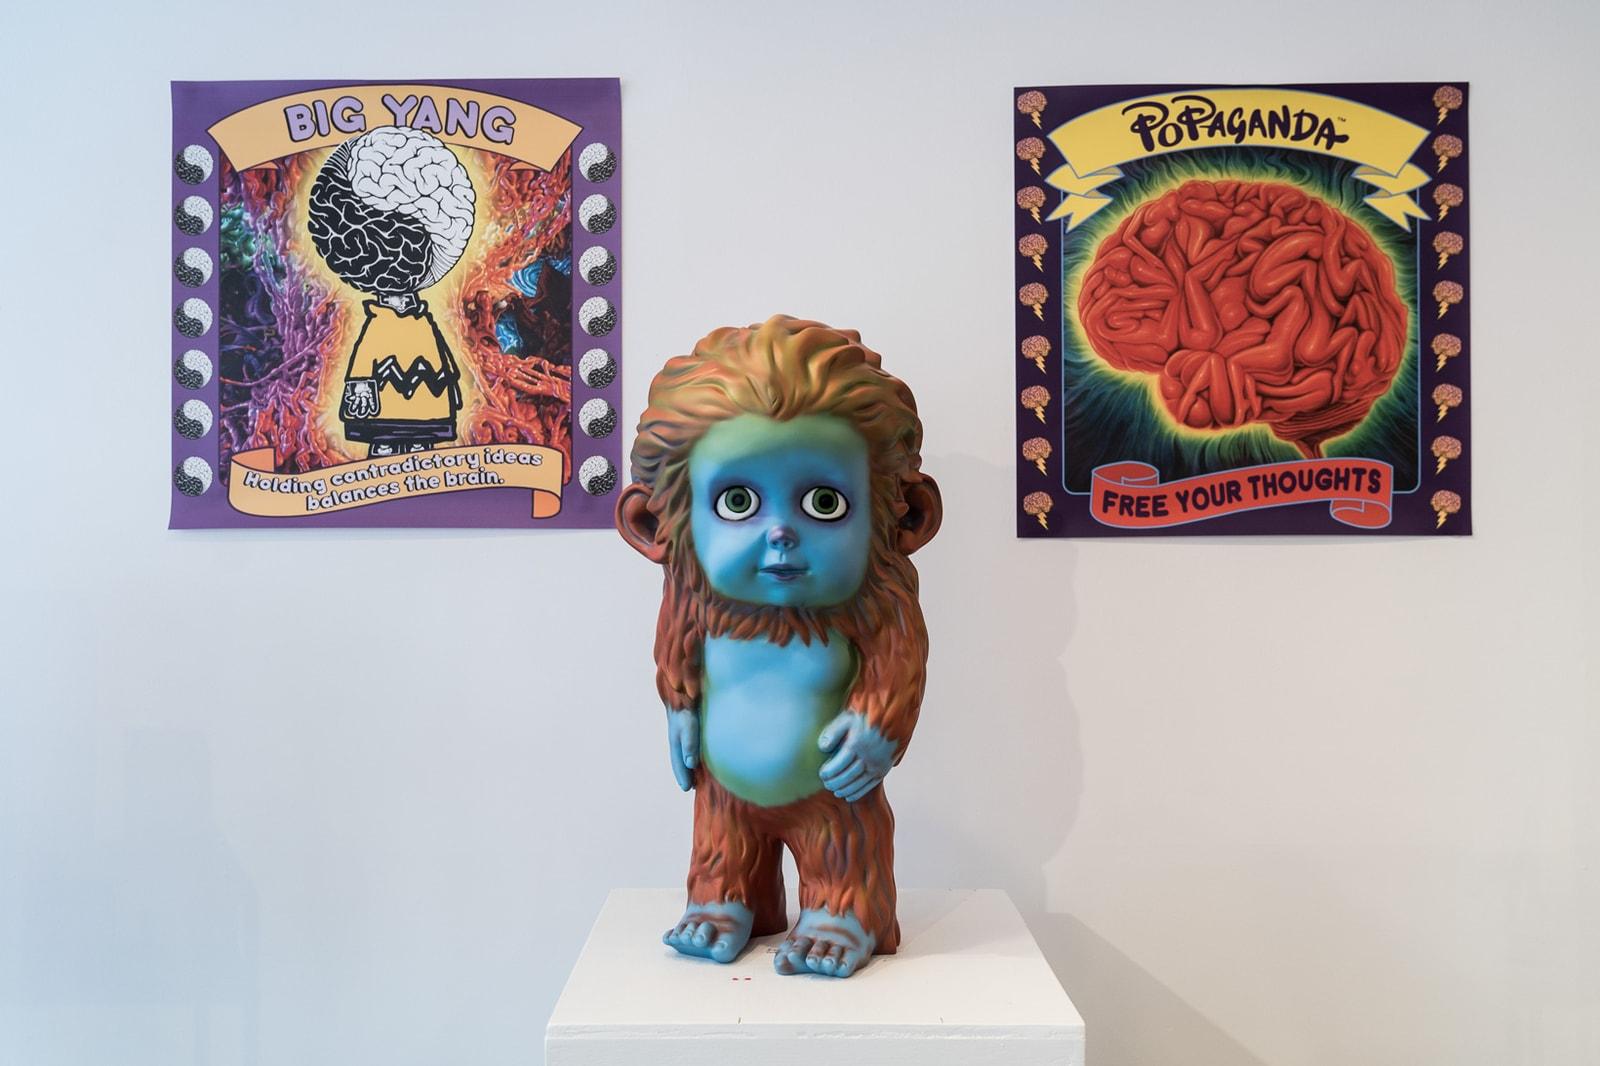 Ron English POPaganda Pop-Up Montreal Interview MURAL Festival 2017 Vinyl Toys Artwork Installations Exhibits Arts Designer Toys Collectibles